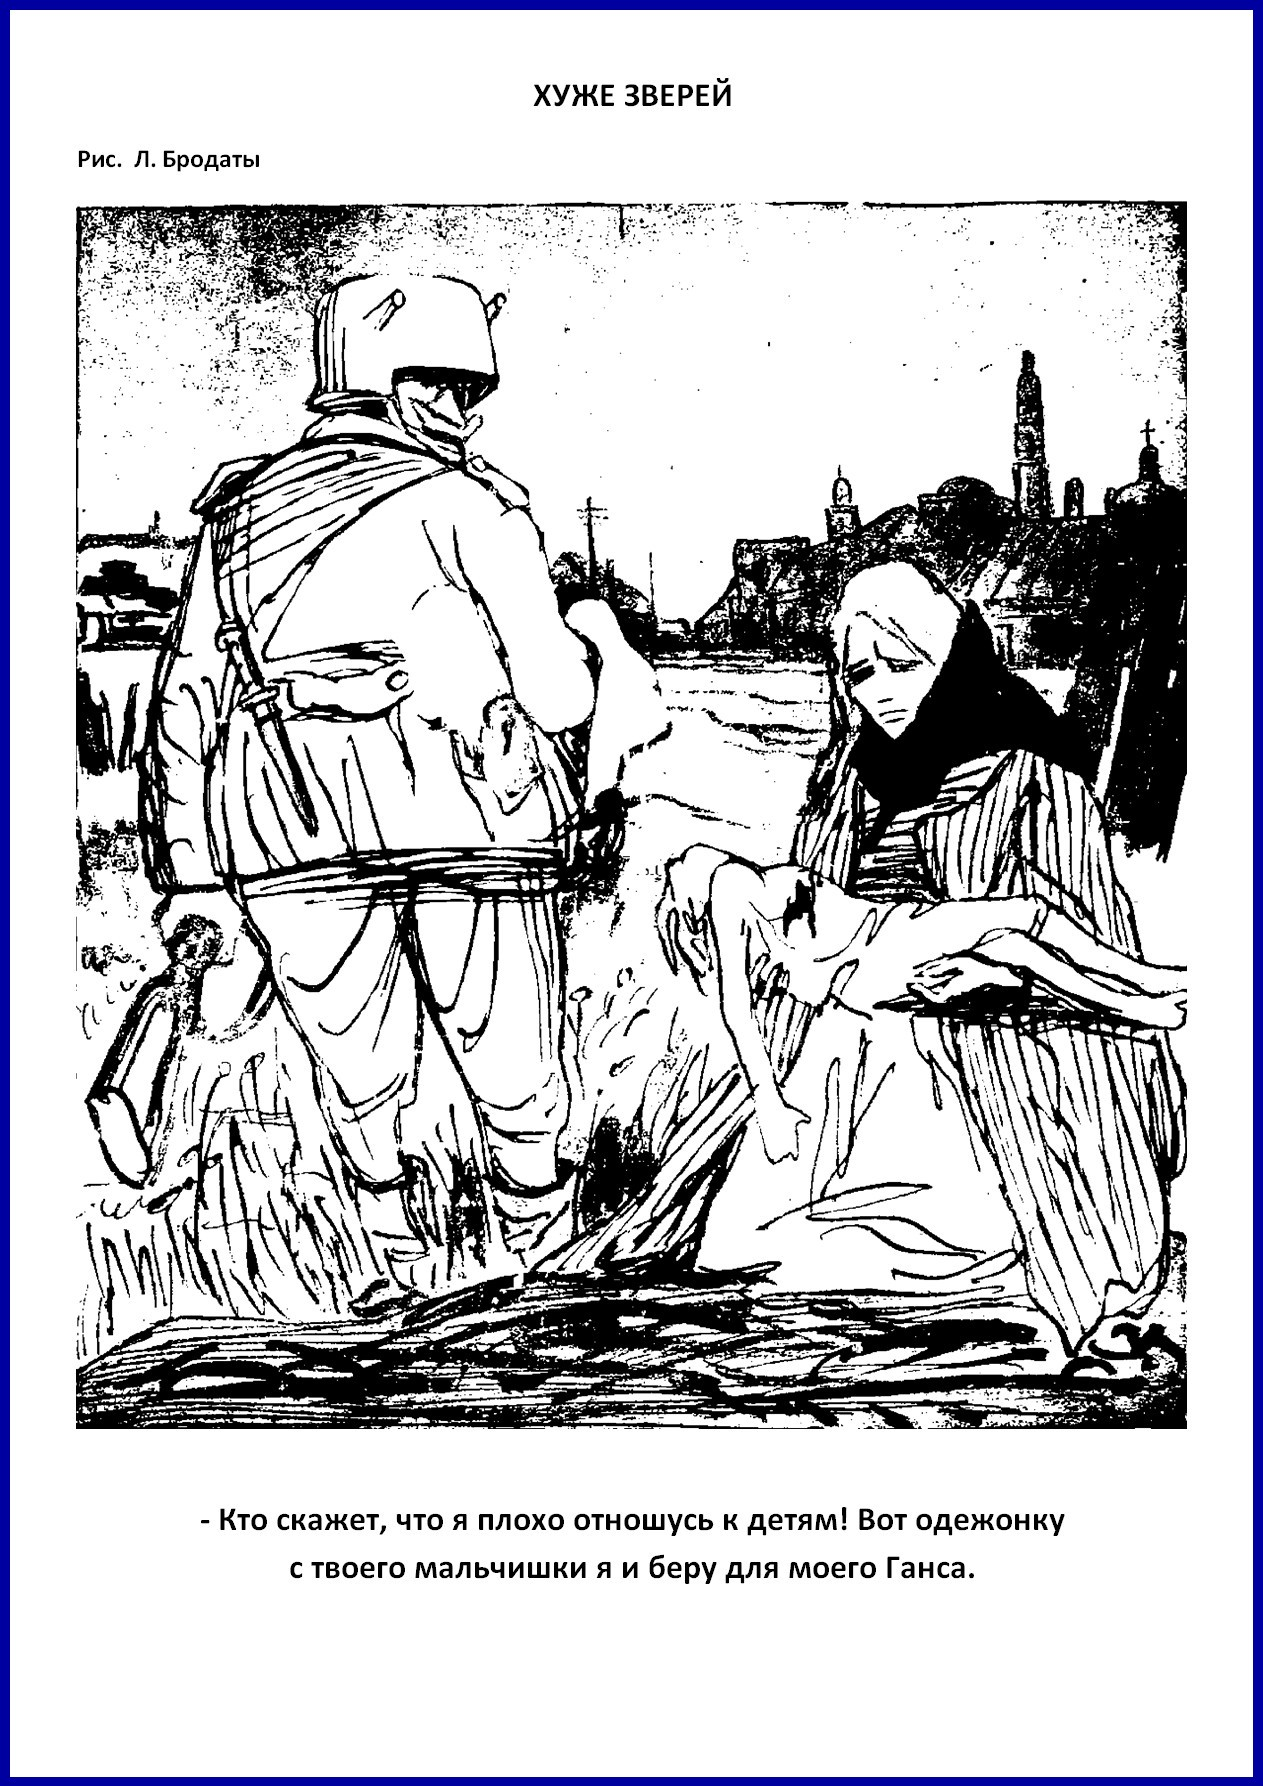 Карикатура на фашистов